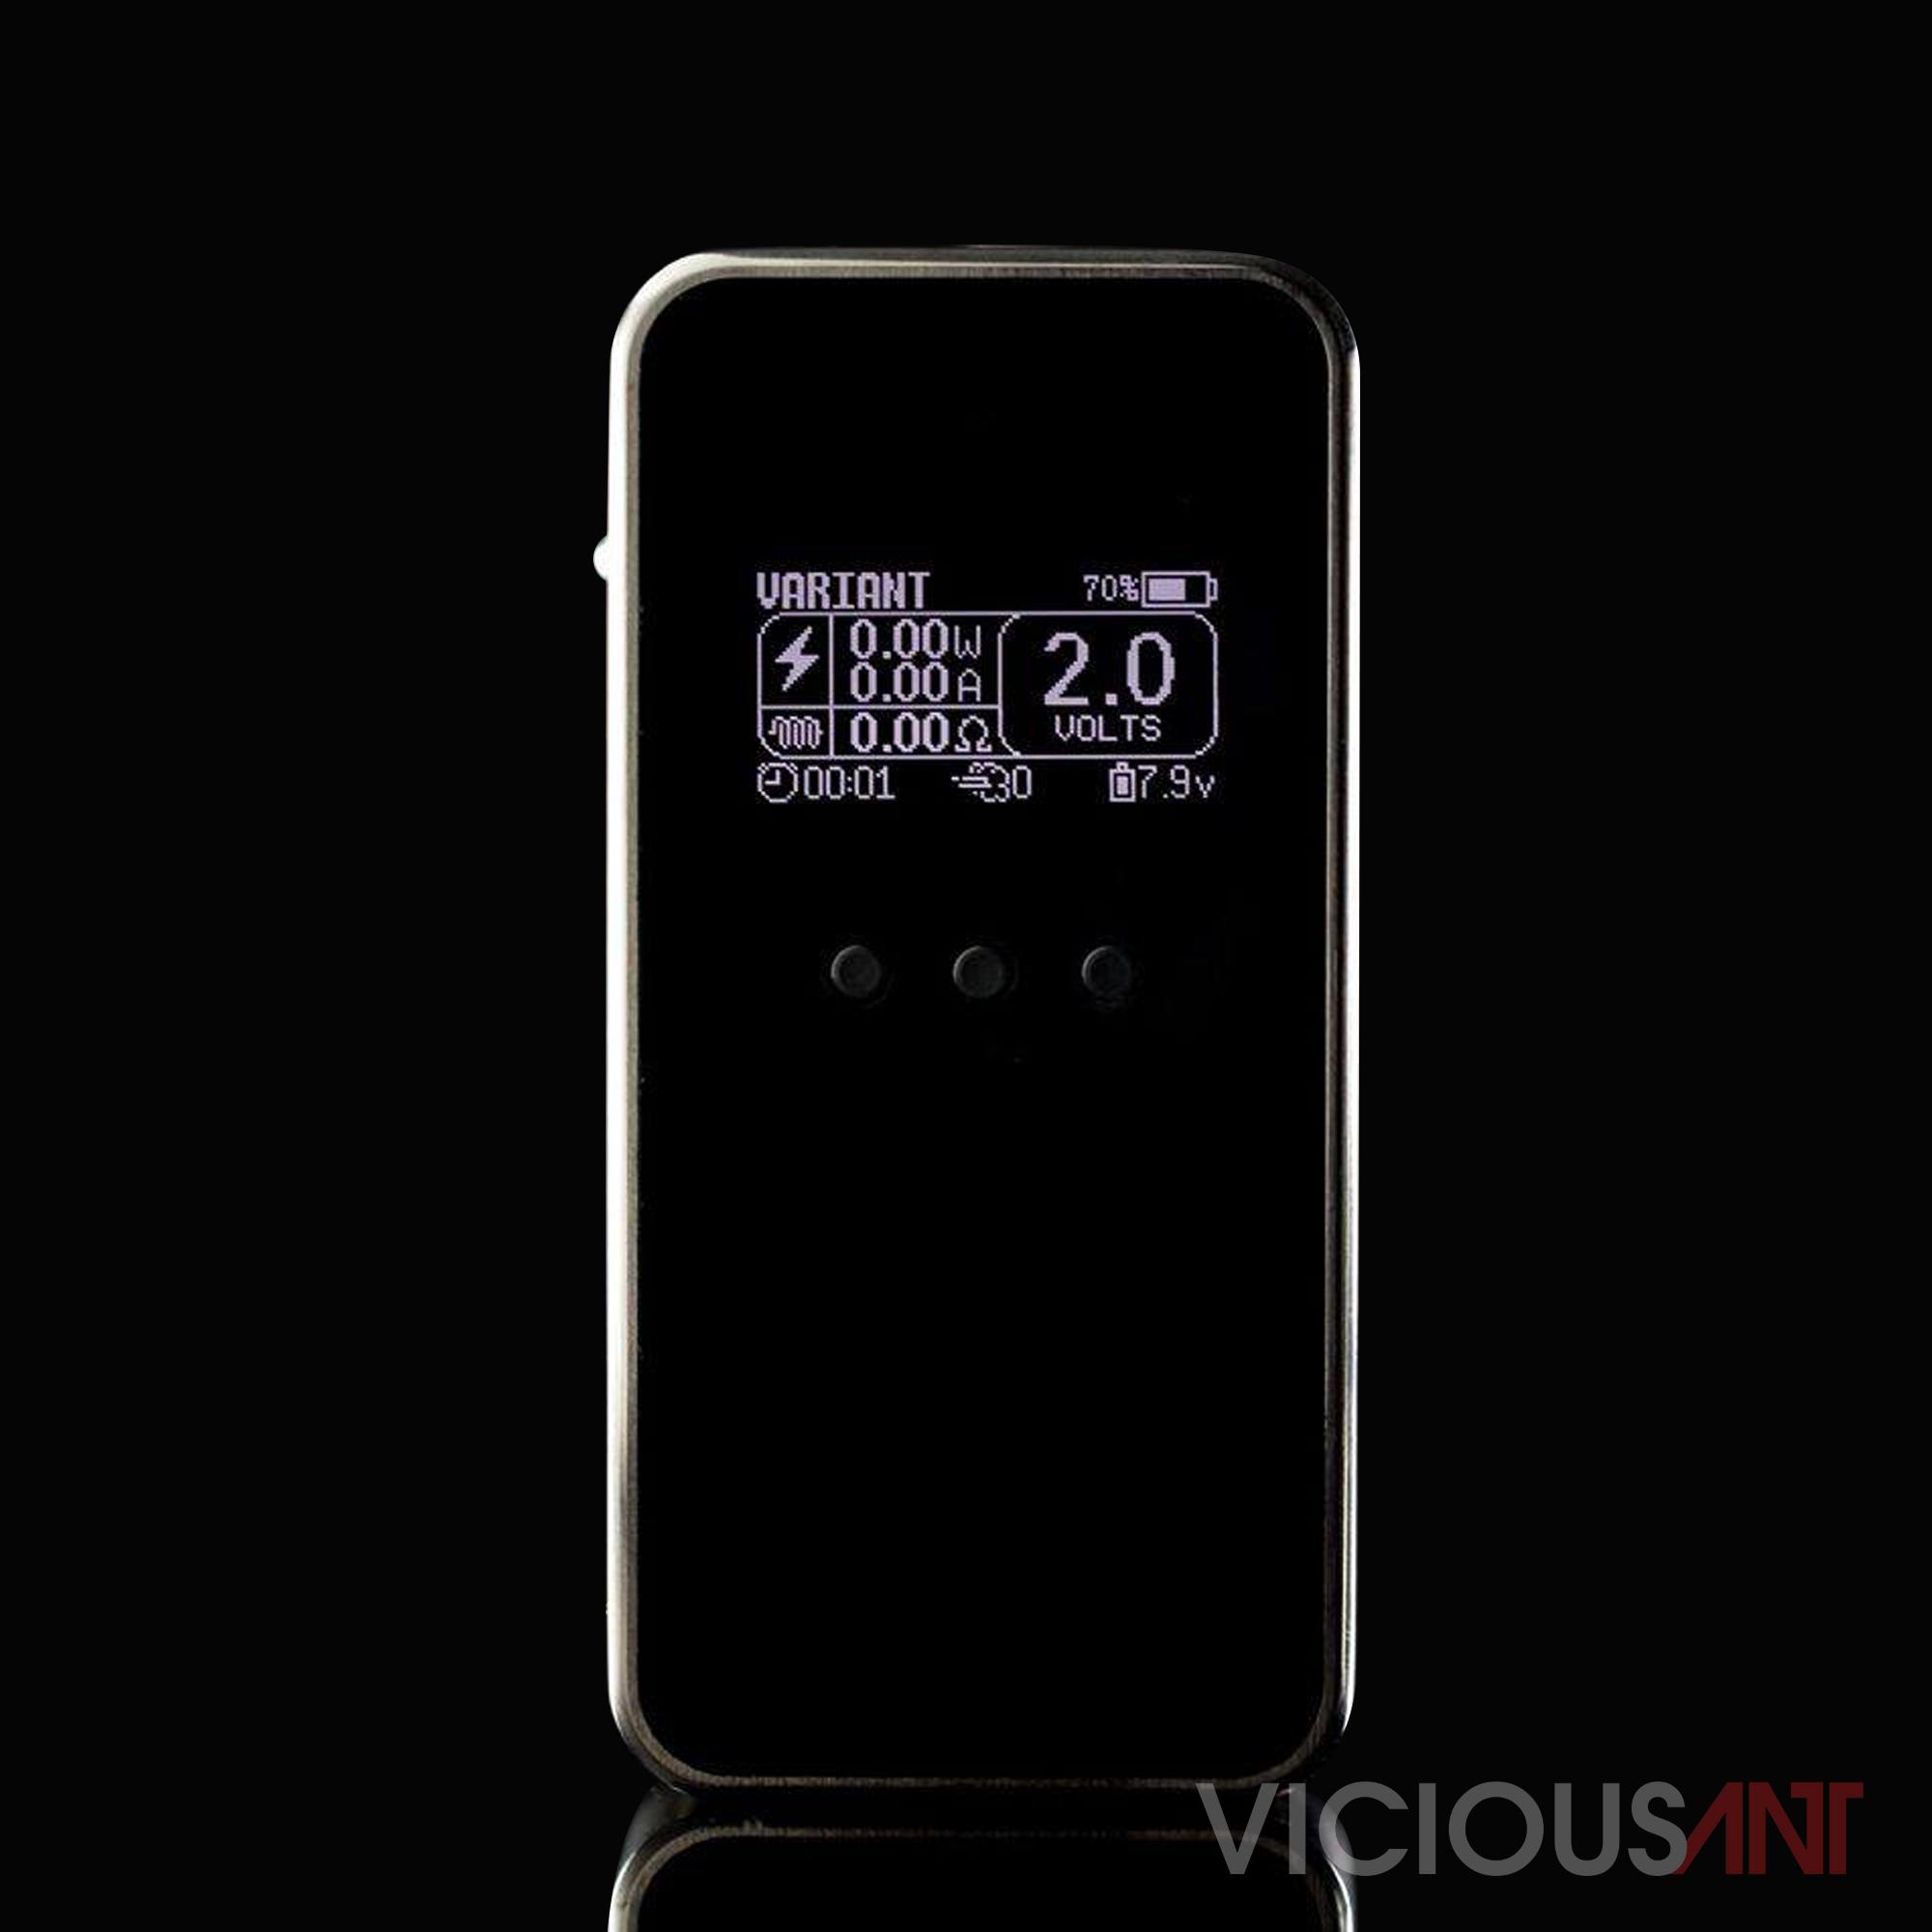 Vicious Ant | Variant Slim